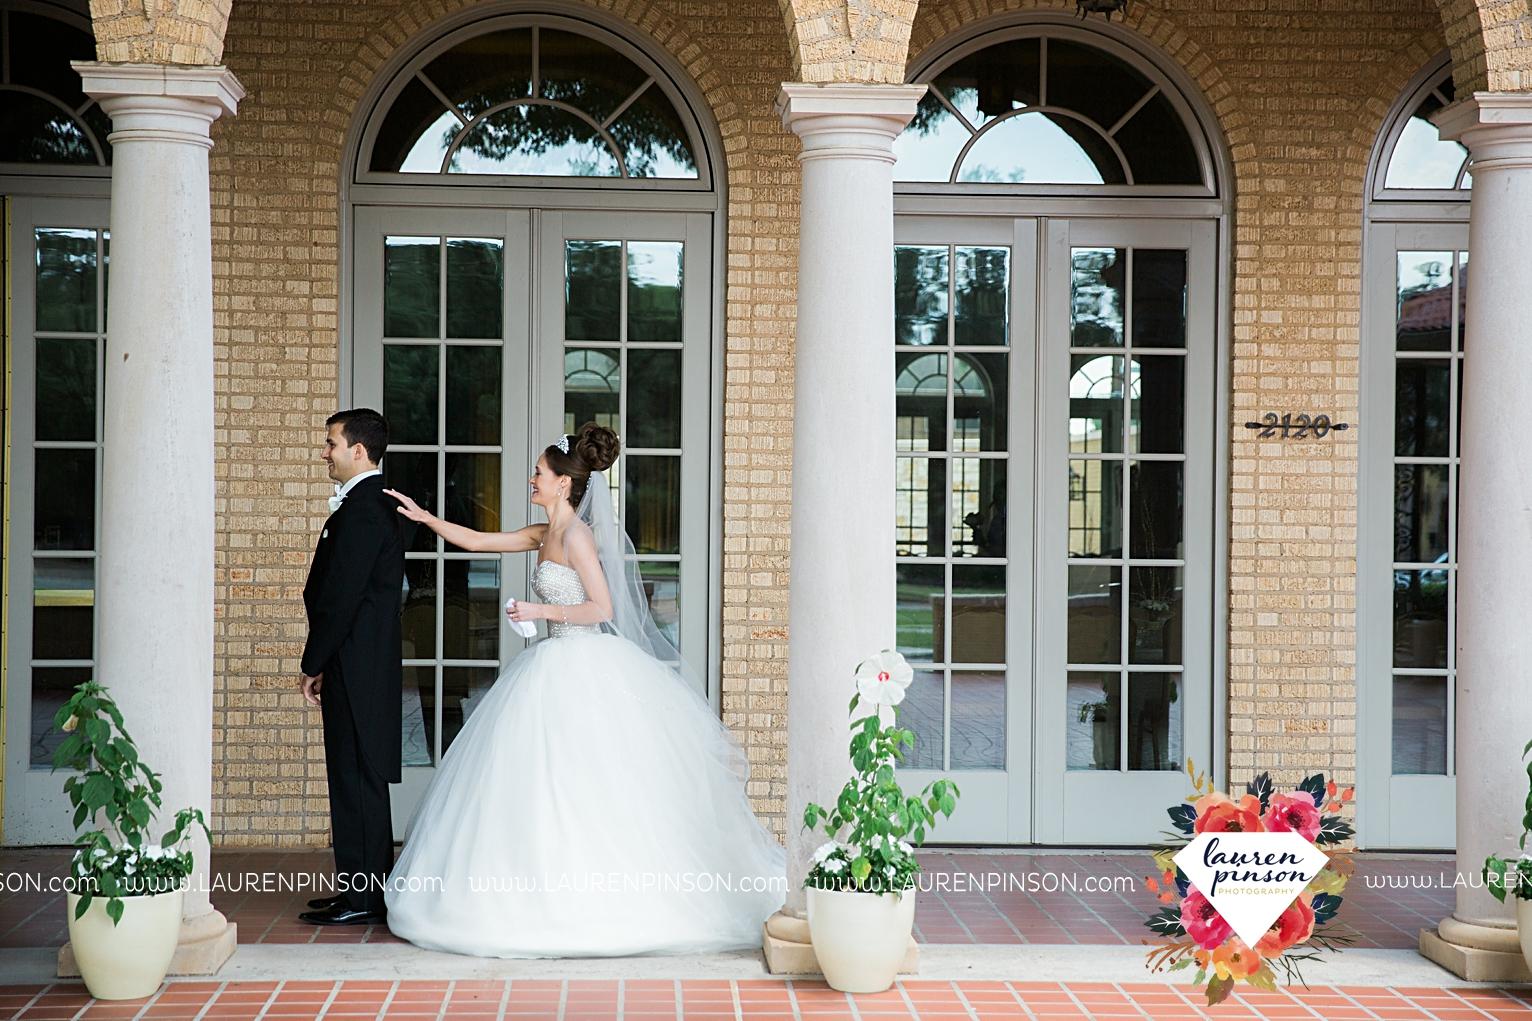 wichita-falls-texas-wedding-photographer-the-forum-by-the-kemp-mayfield-events-ulta-gold-glitter_2821.jpg